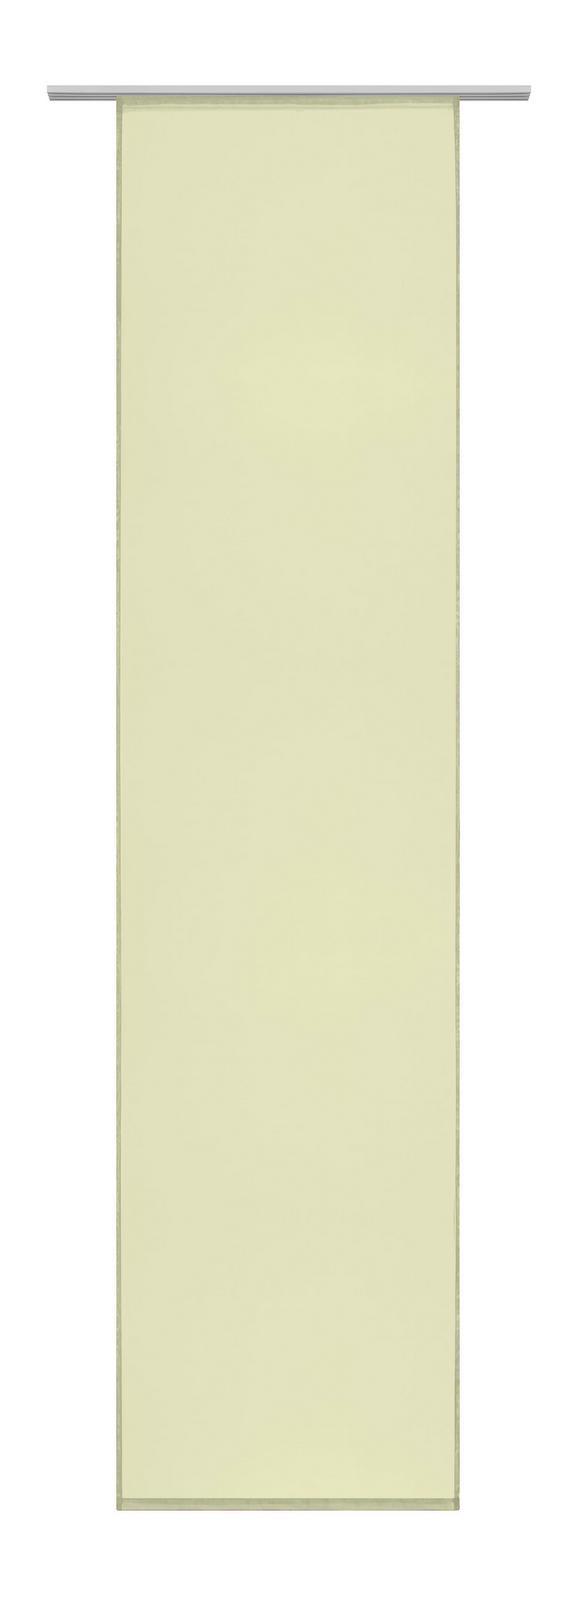 FLÄCHENVORHANG Flipp Grün 60x245cm - Grün, Textil (60/245cm) - Based